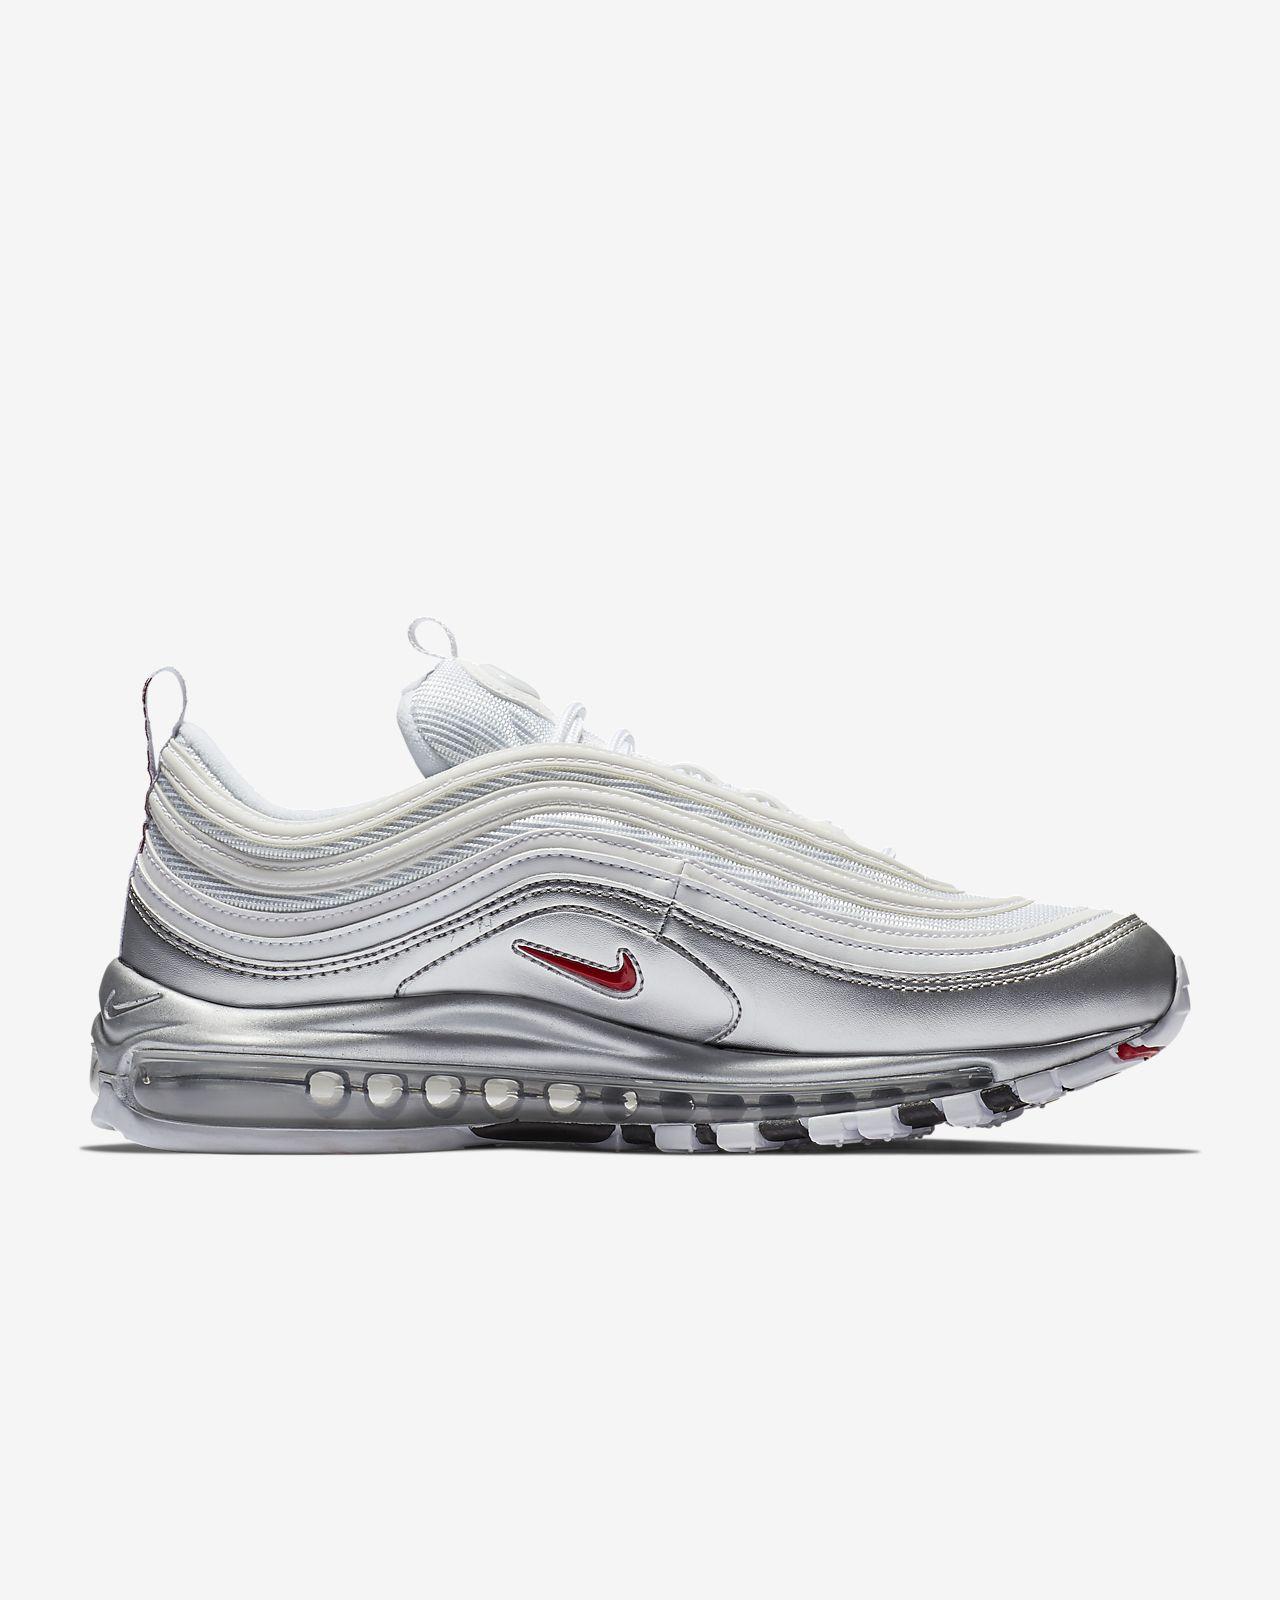 save off 21580 6e9ce ... Nike Air Max 97 QS Men s Shoe